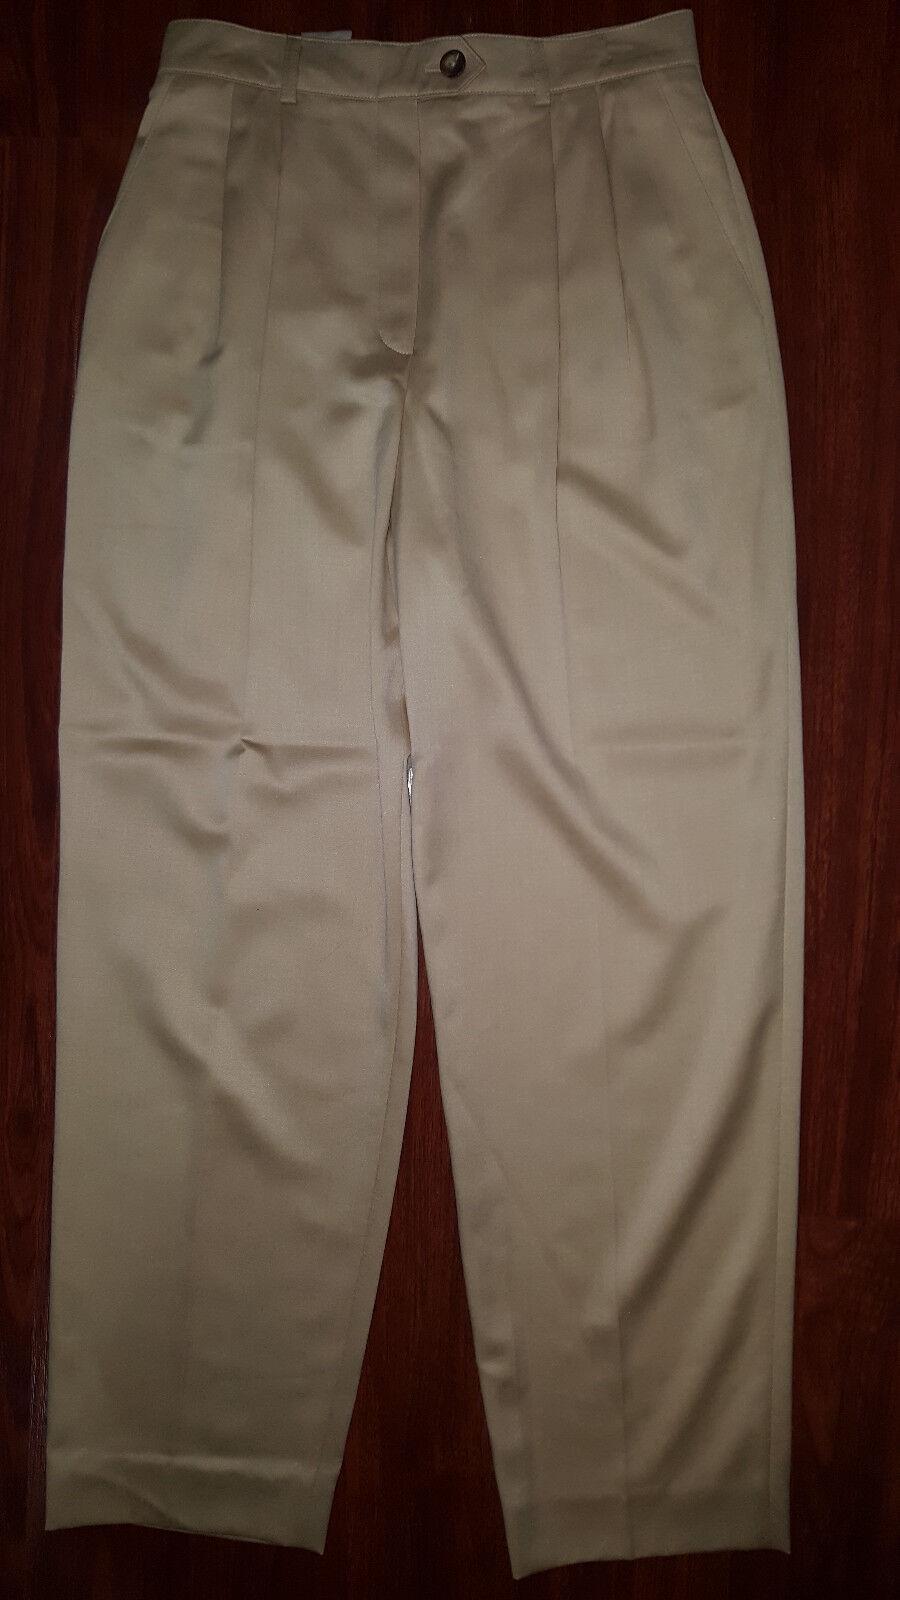 ESCADA Womens Pleated Front Dress Casual Pant Size 36 (USA Sz 8) Dark Beige